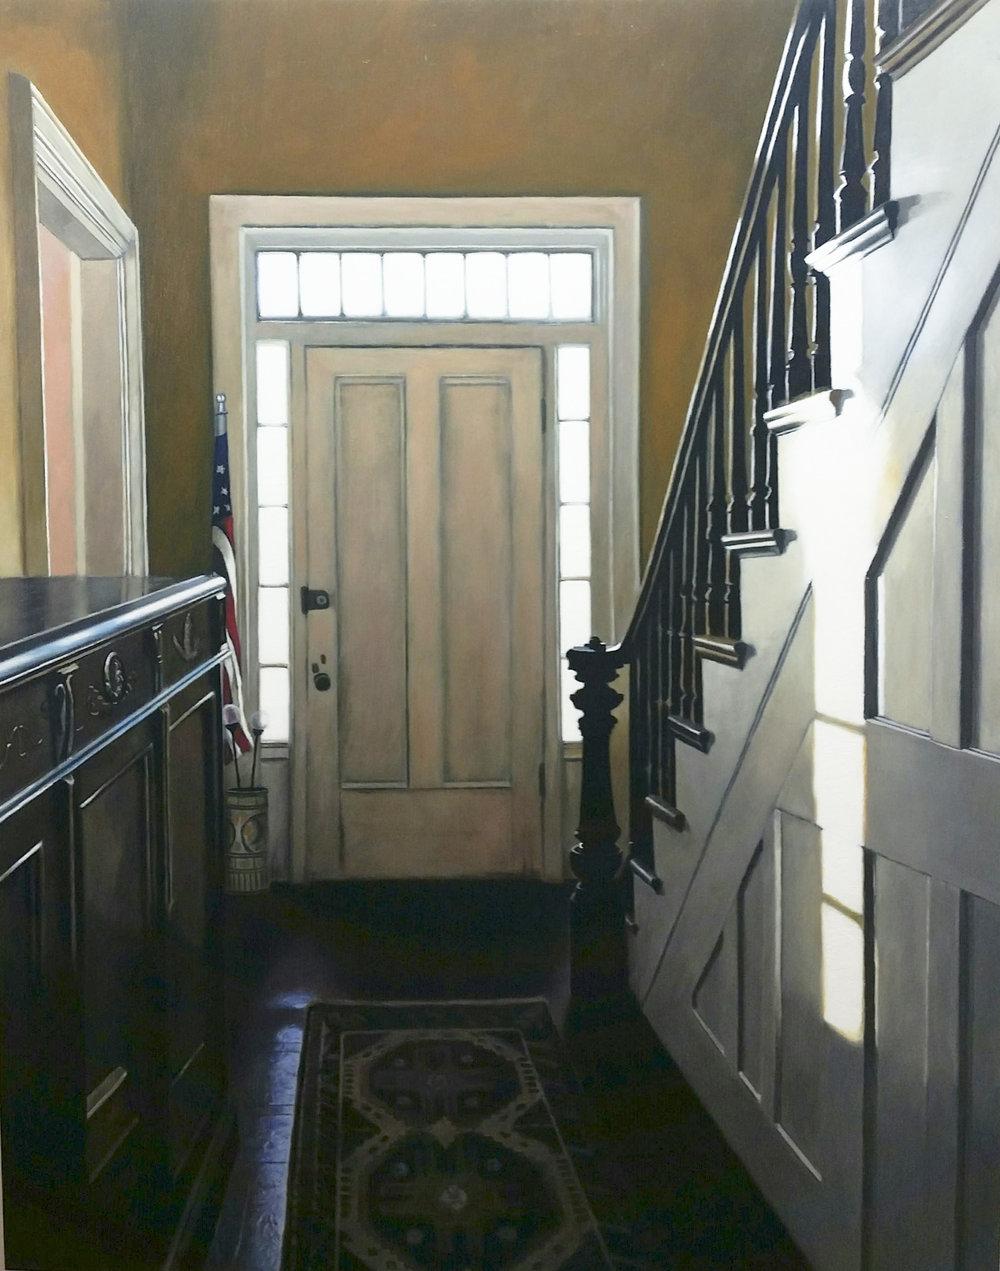 Webster's Hallway,   oil on panel,  28x22